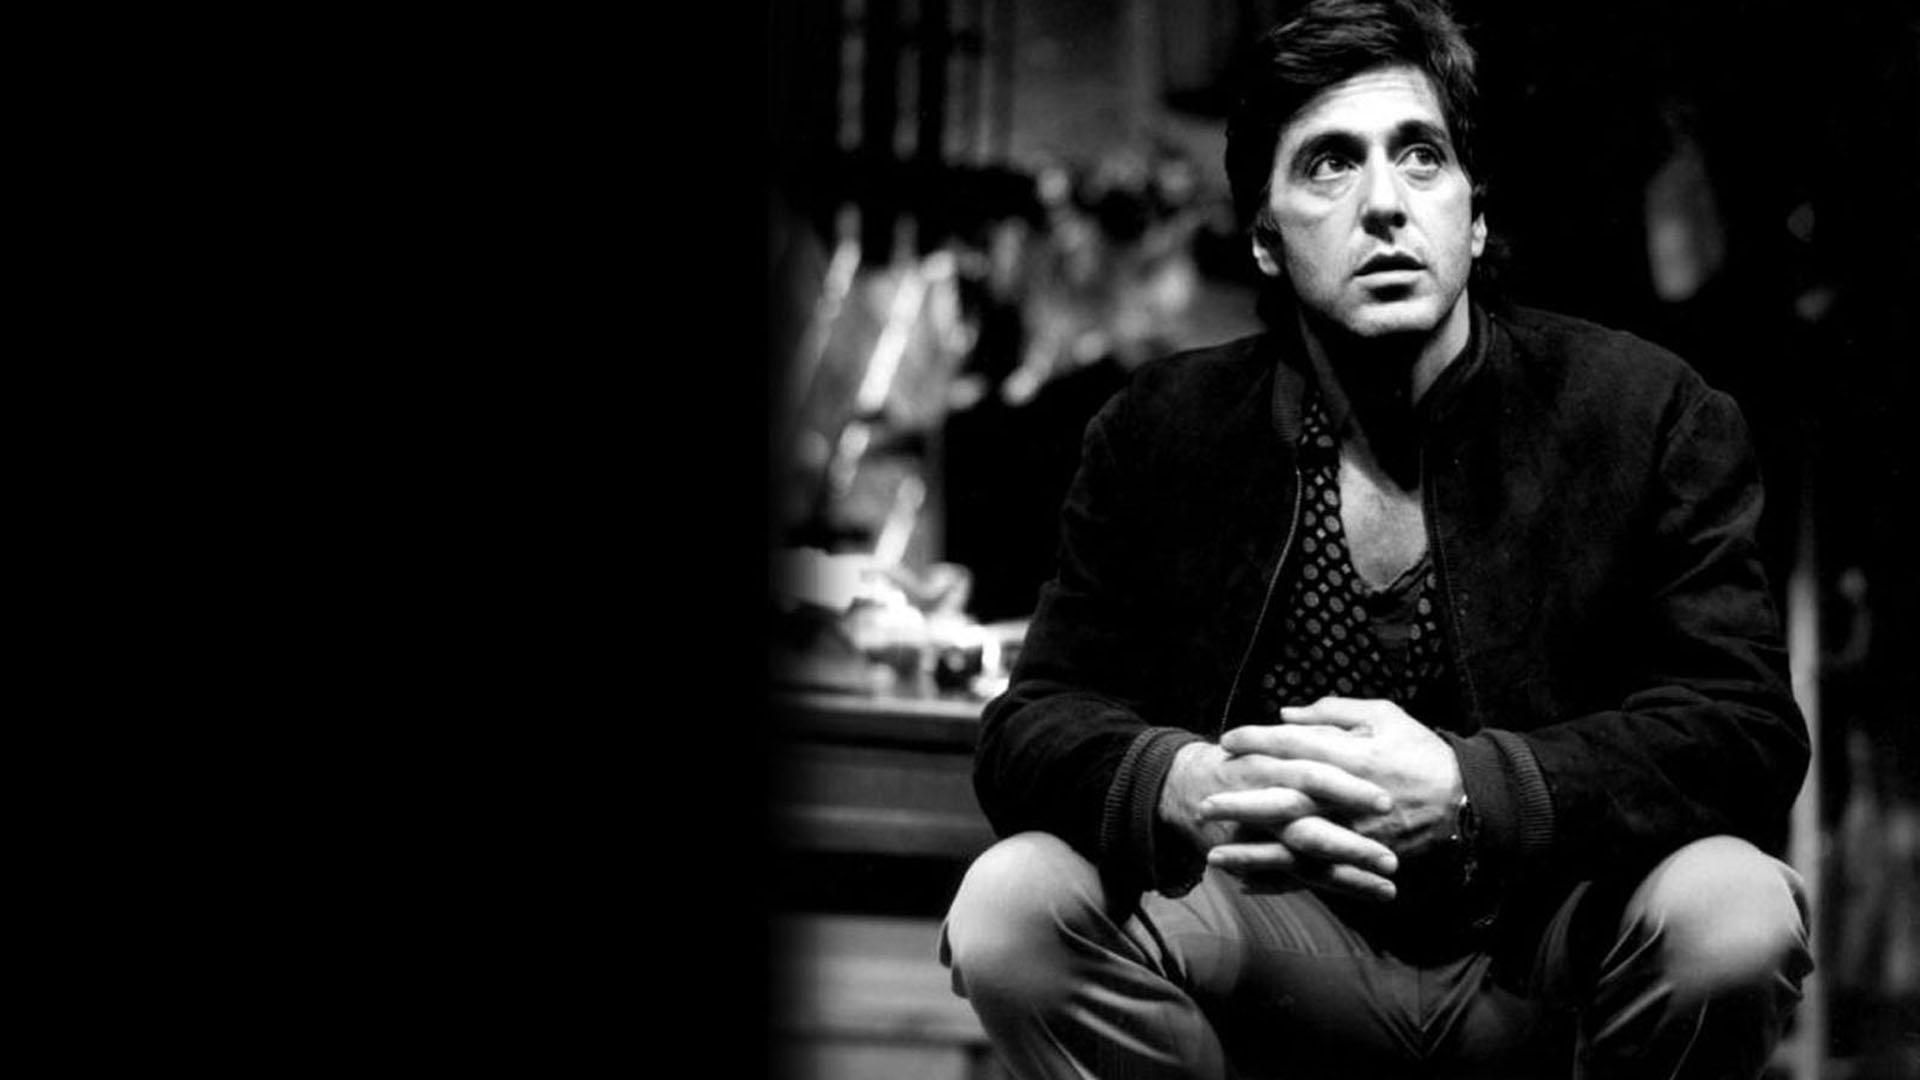 44 Pacino Wallpaper On Wallpapersafari